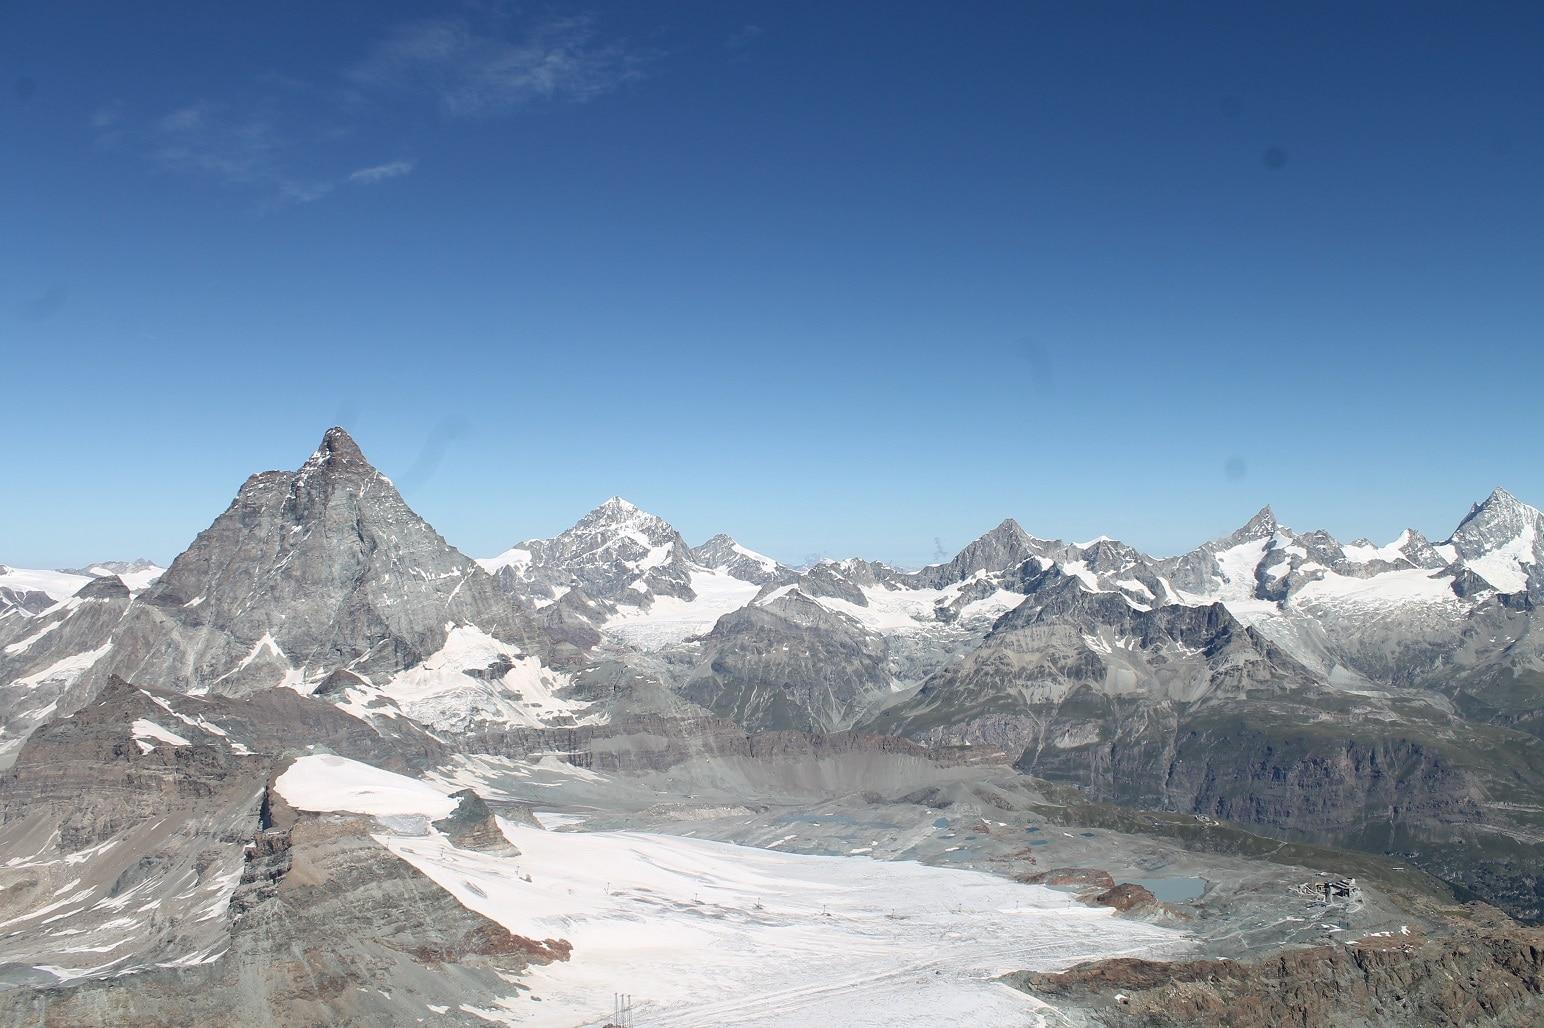 zermatt_panorama_matterhorn_glacier_paradise